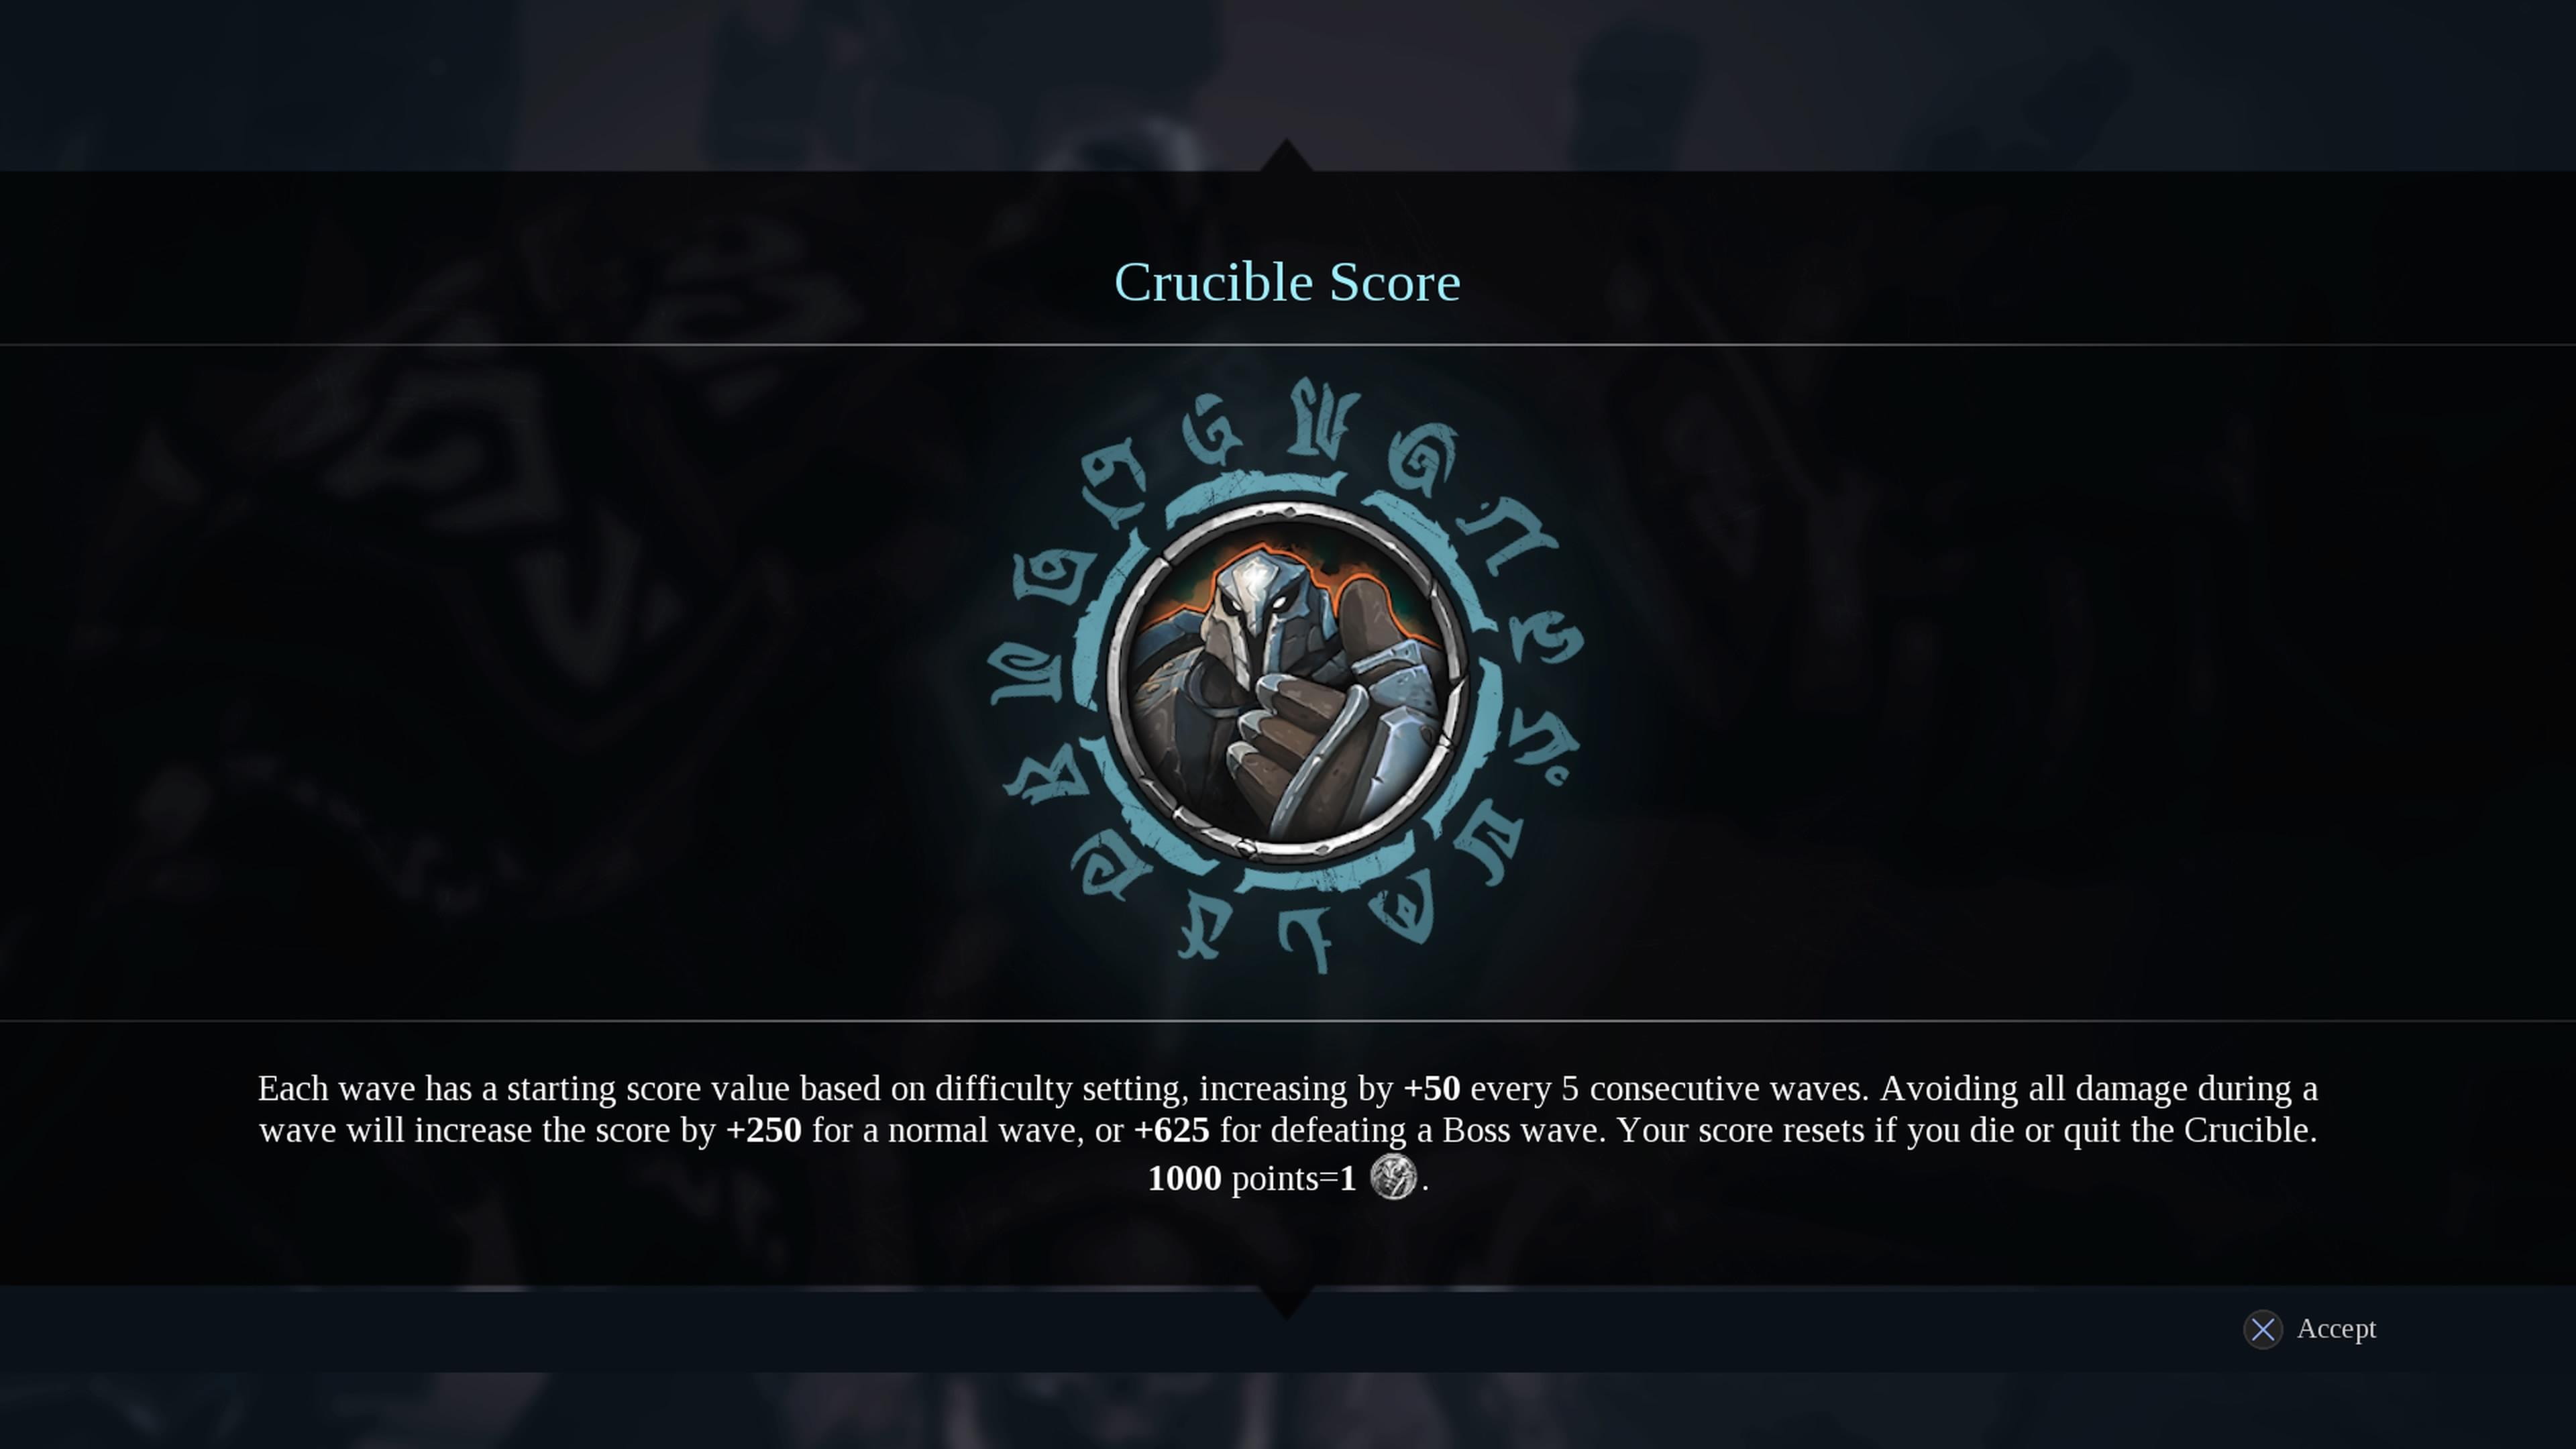 Darksiders III - The Crucible DLC Trophy Guide • PSNProfiles com